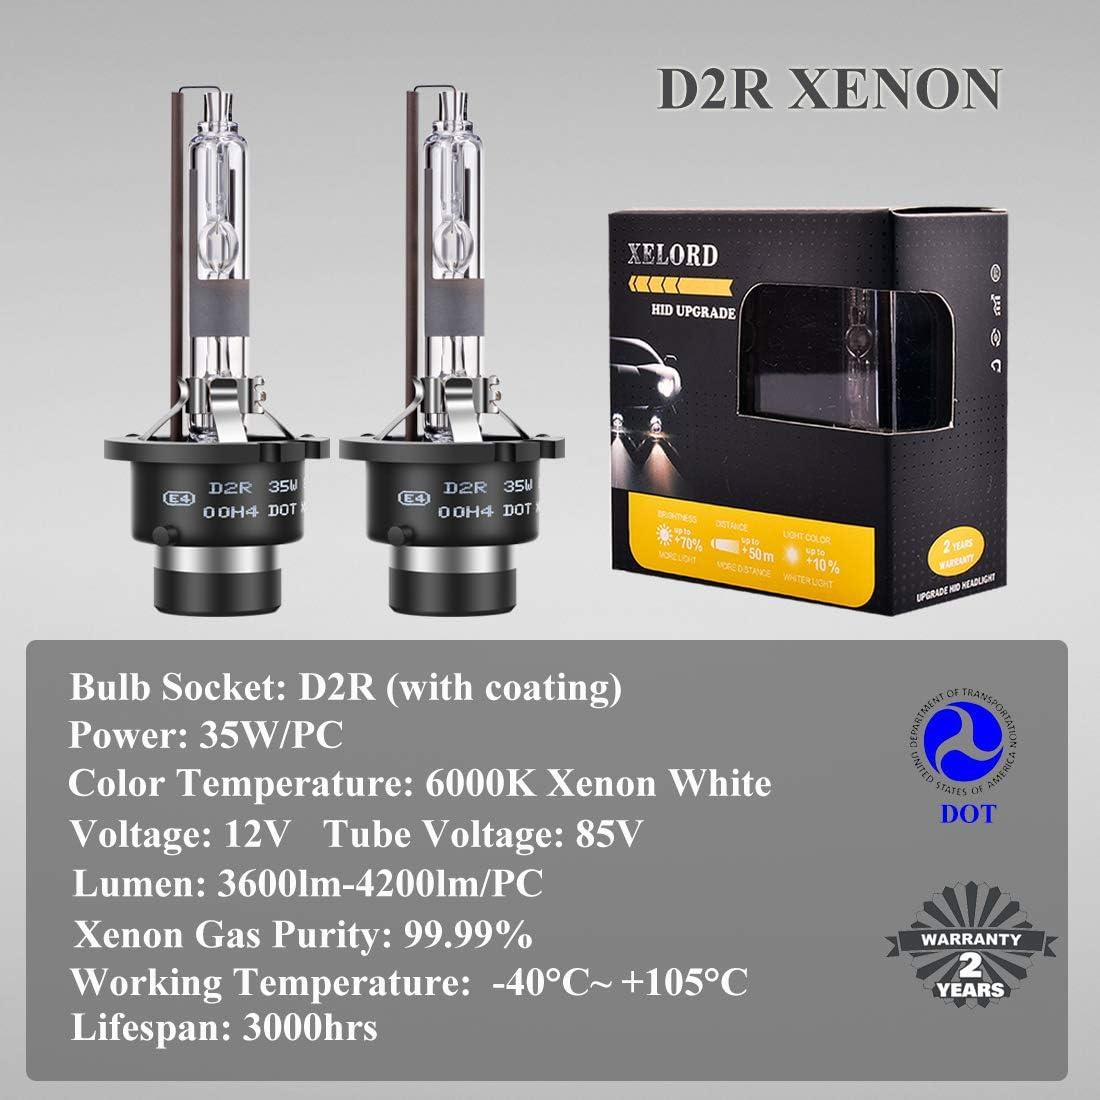 Upgrade Version XELORD D2R Headlight Bulb 6000K Xenon White Ultra Bright 35W 12V Car Headlamp Replacement HID Bulbs D2R 6000K 2 Lamps